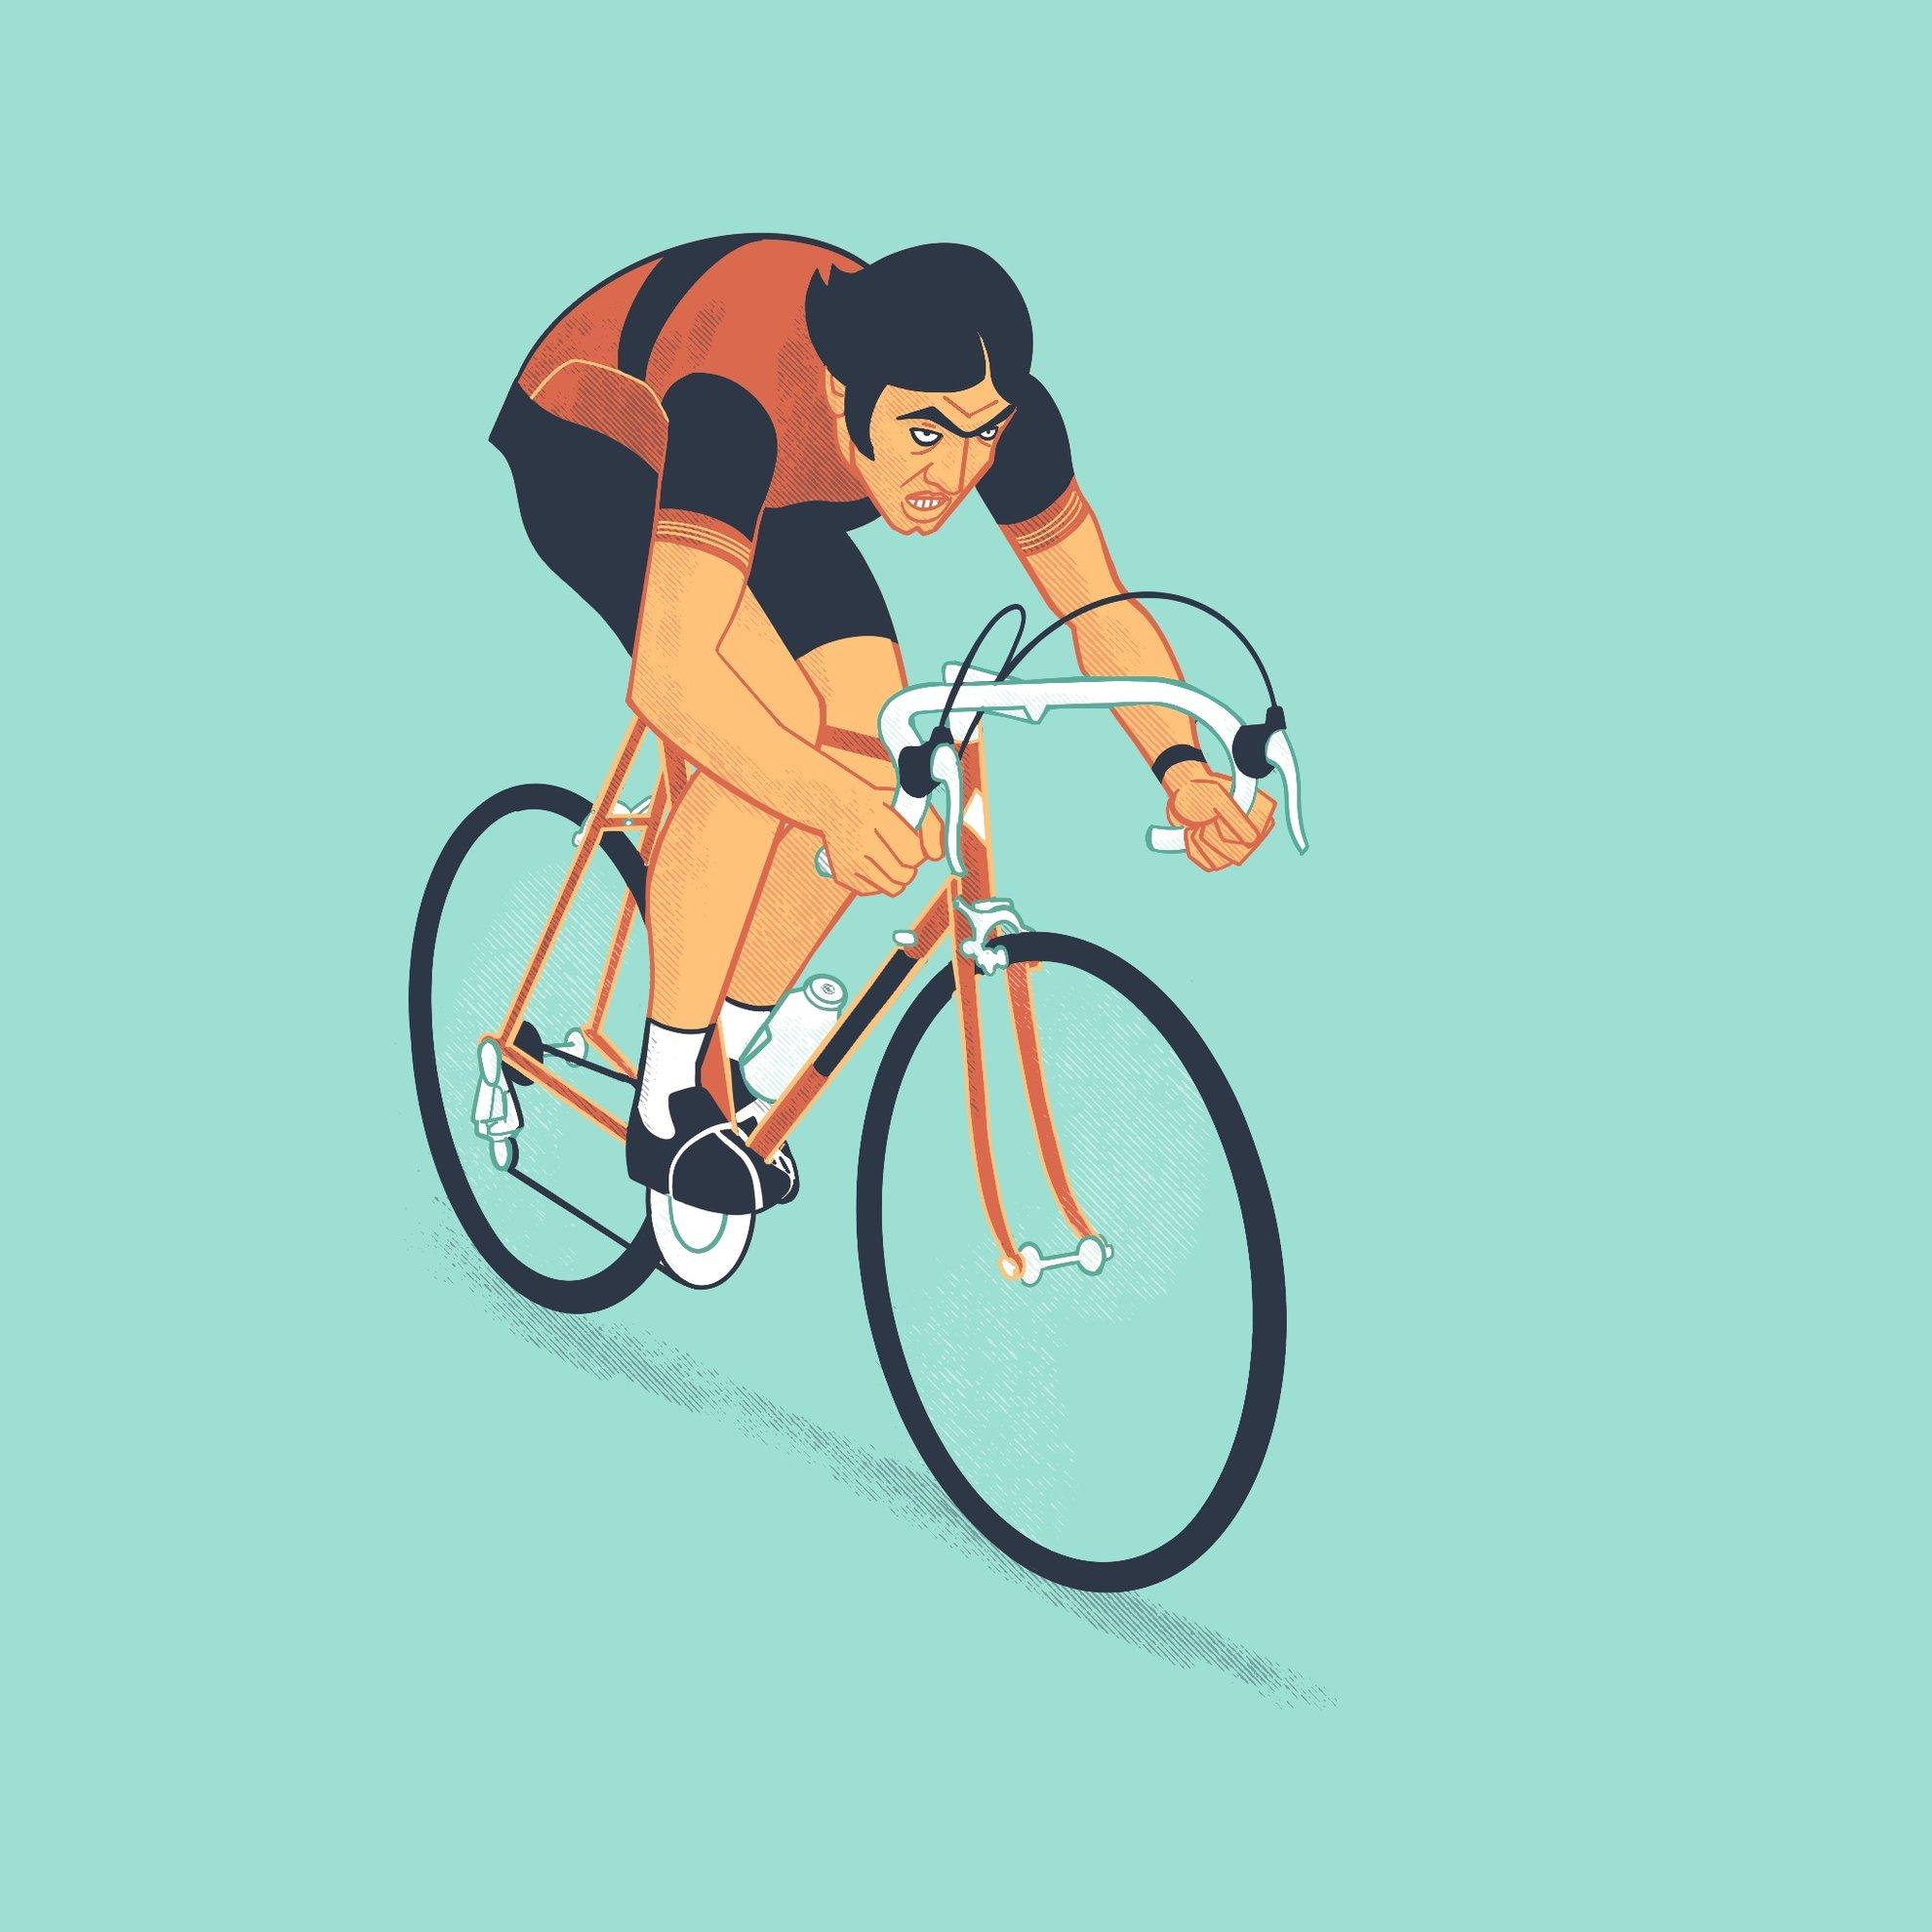 Travail personnel / Merckx